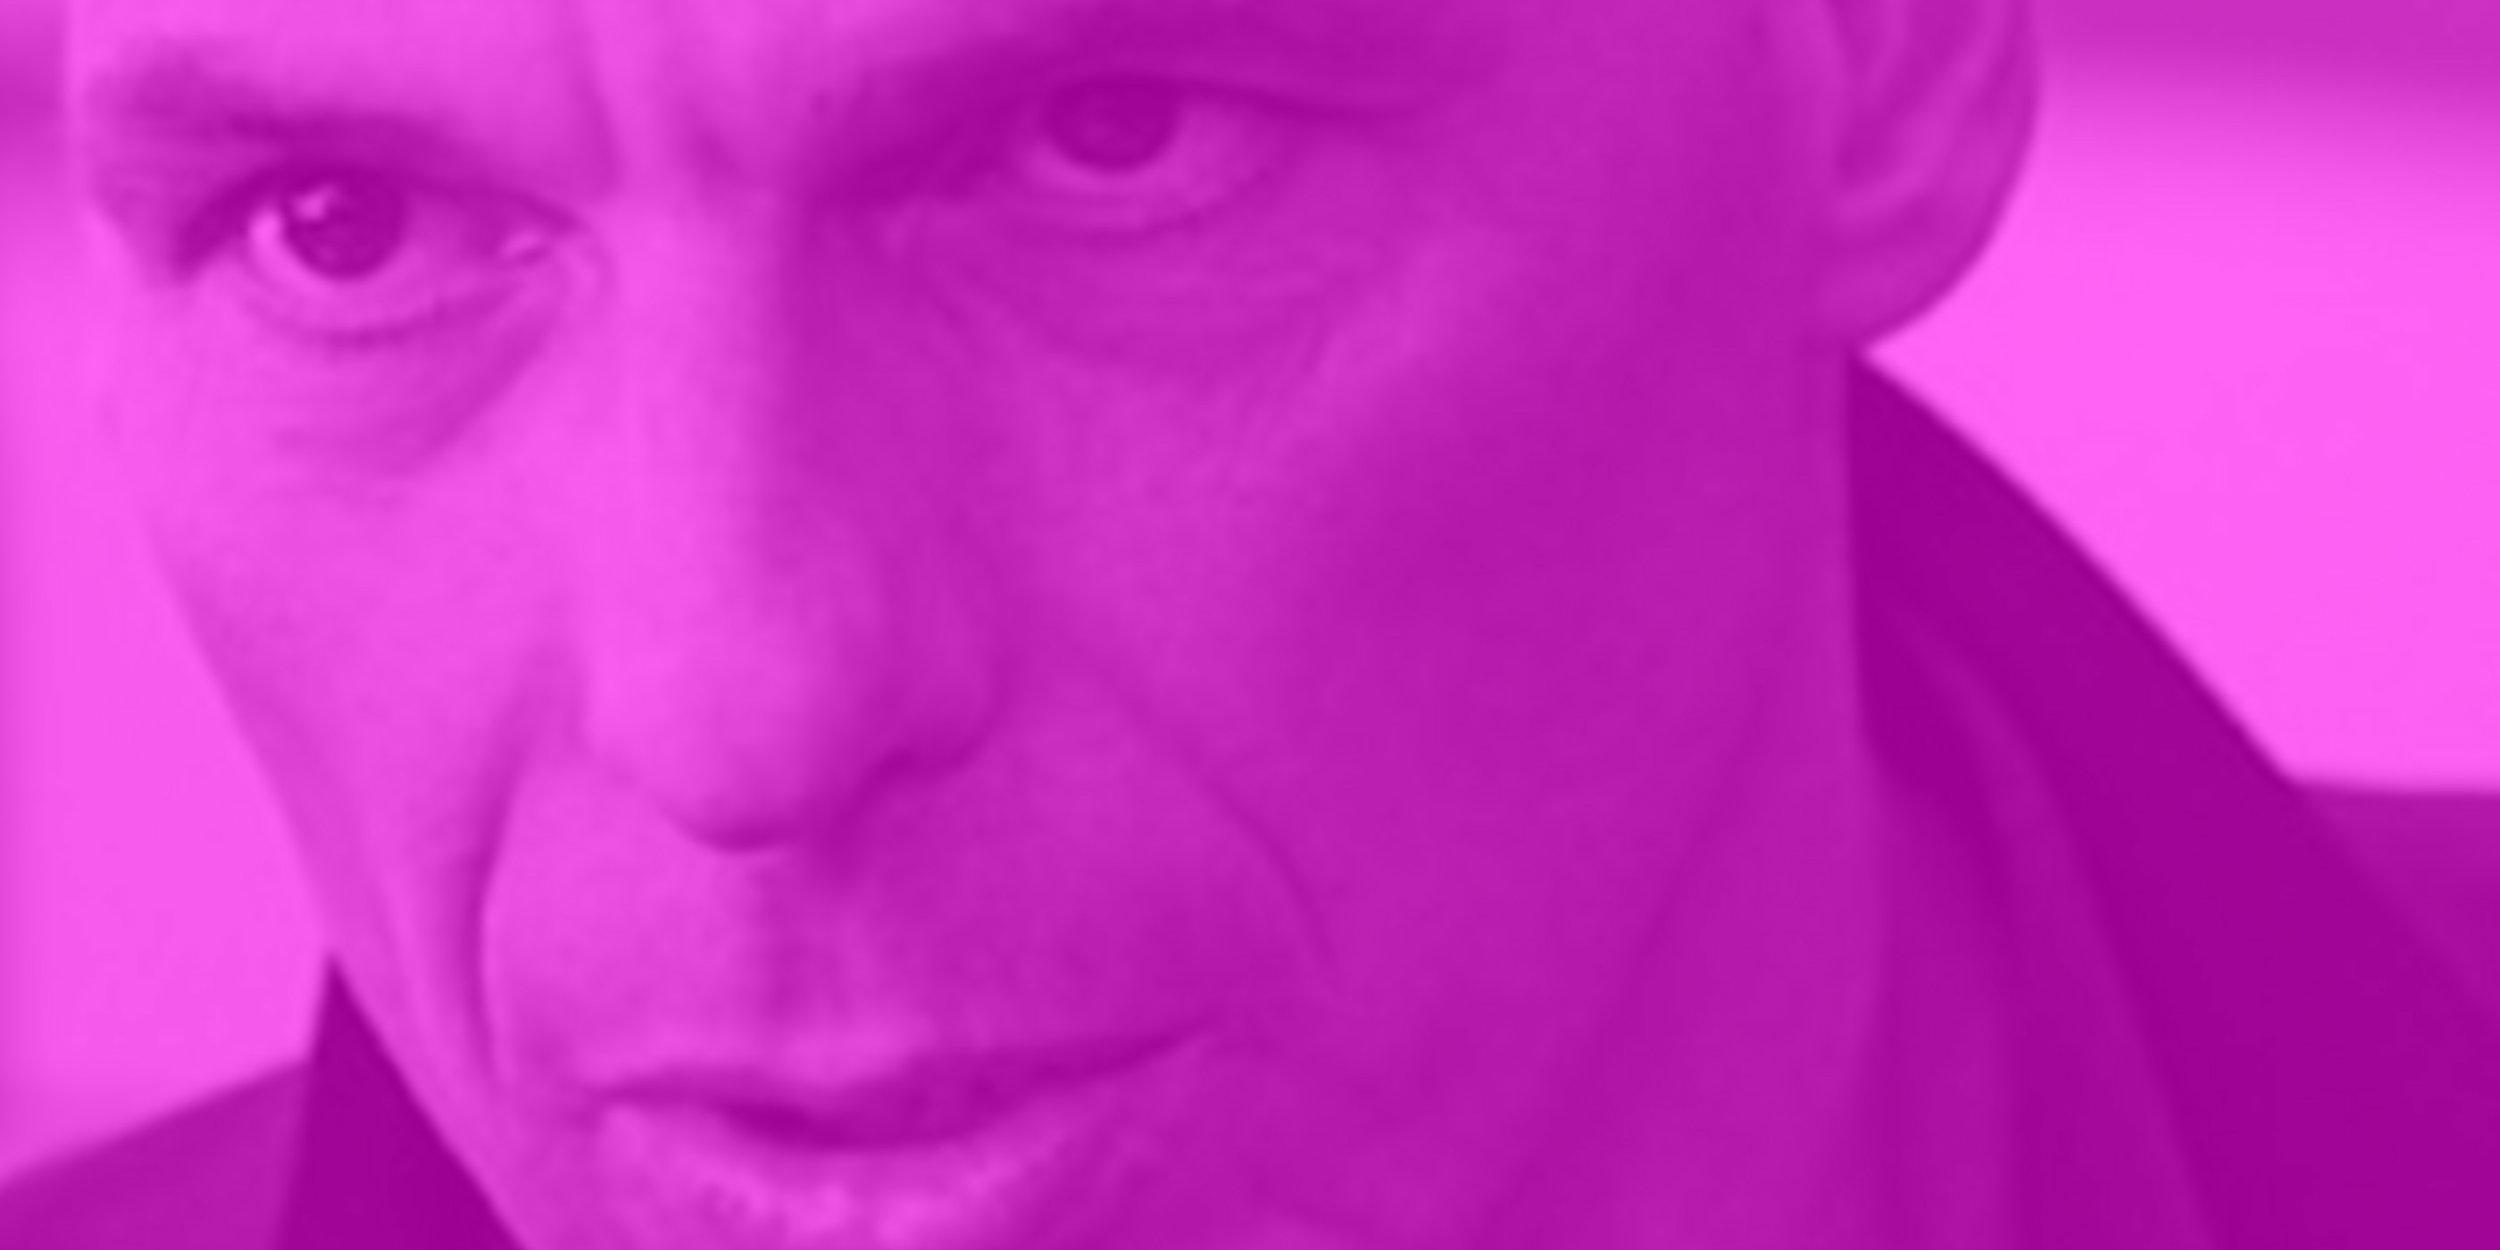 2zu1_Varoufakis_kopie.jpg